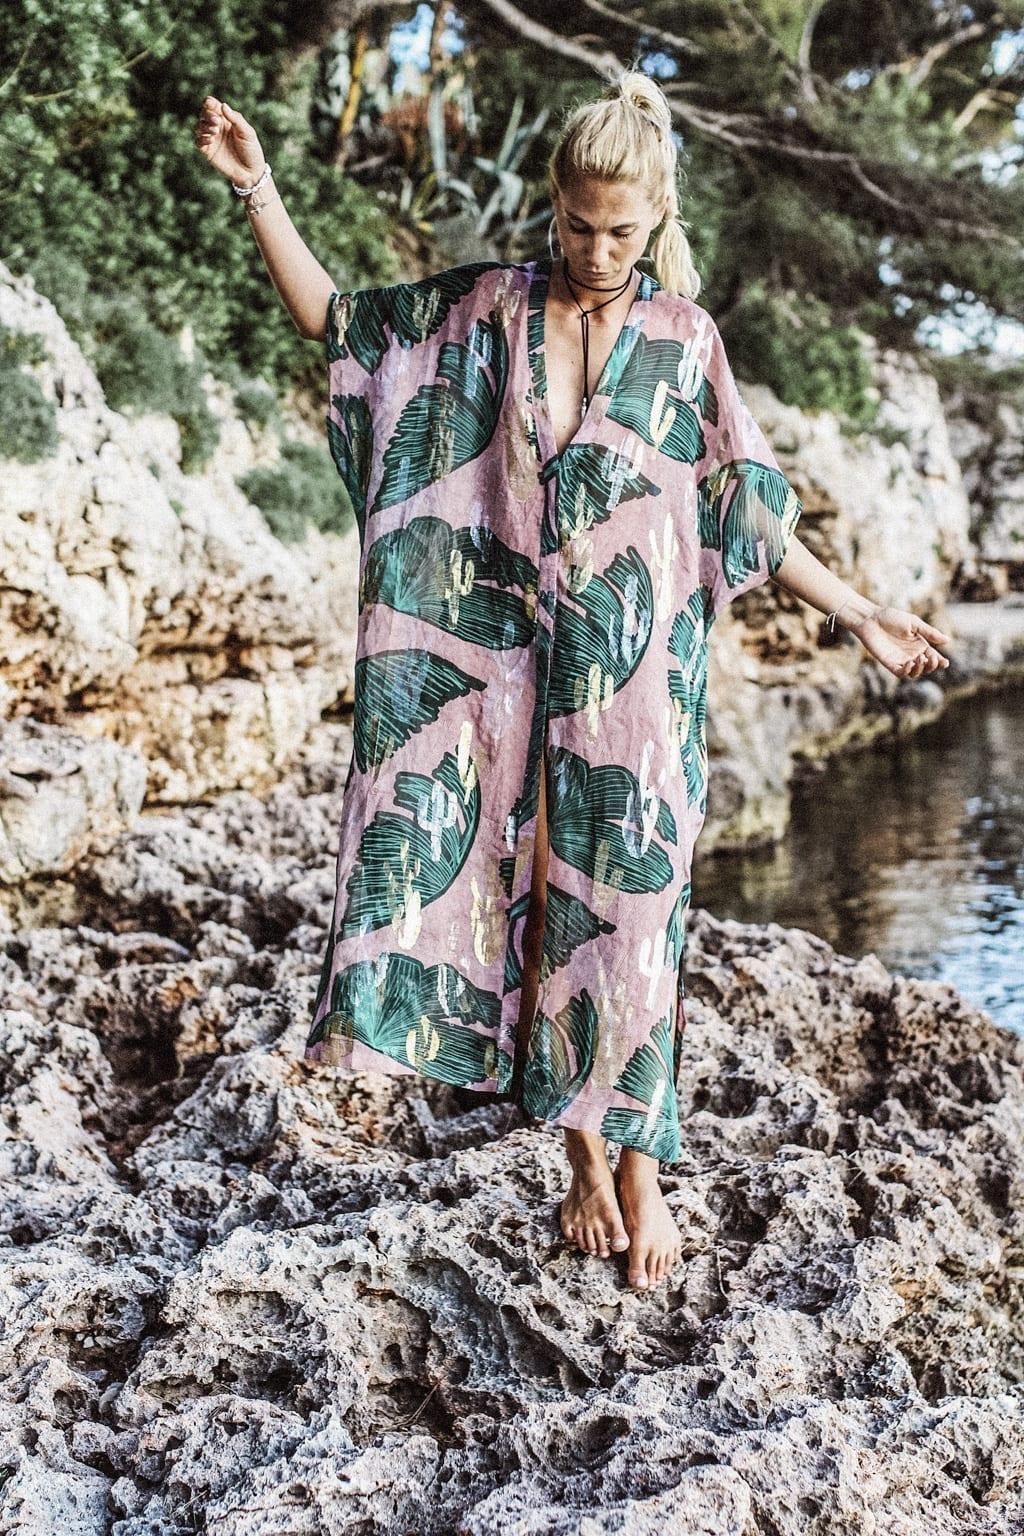 CK-1606-Mallorca-Island-Spain-Luxury-Holiday-Blogger-Beach-Outfit-Style-Fashion-Baleares-1278